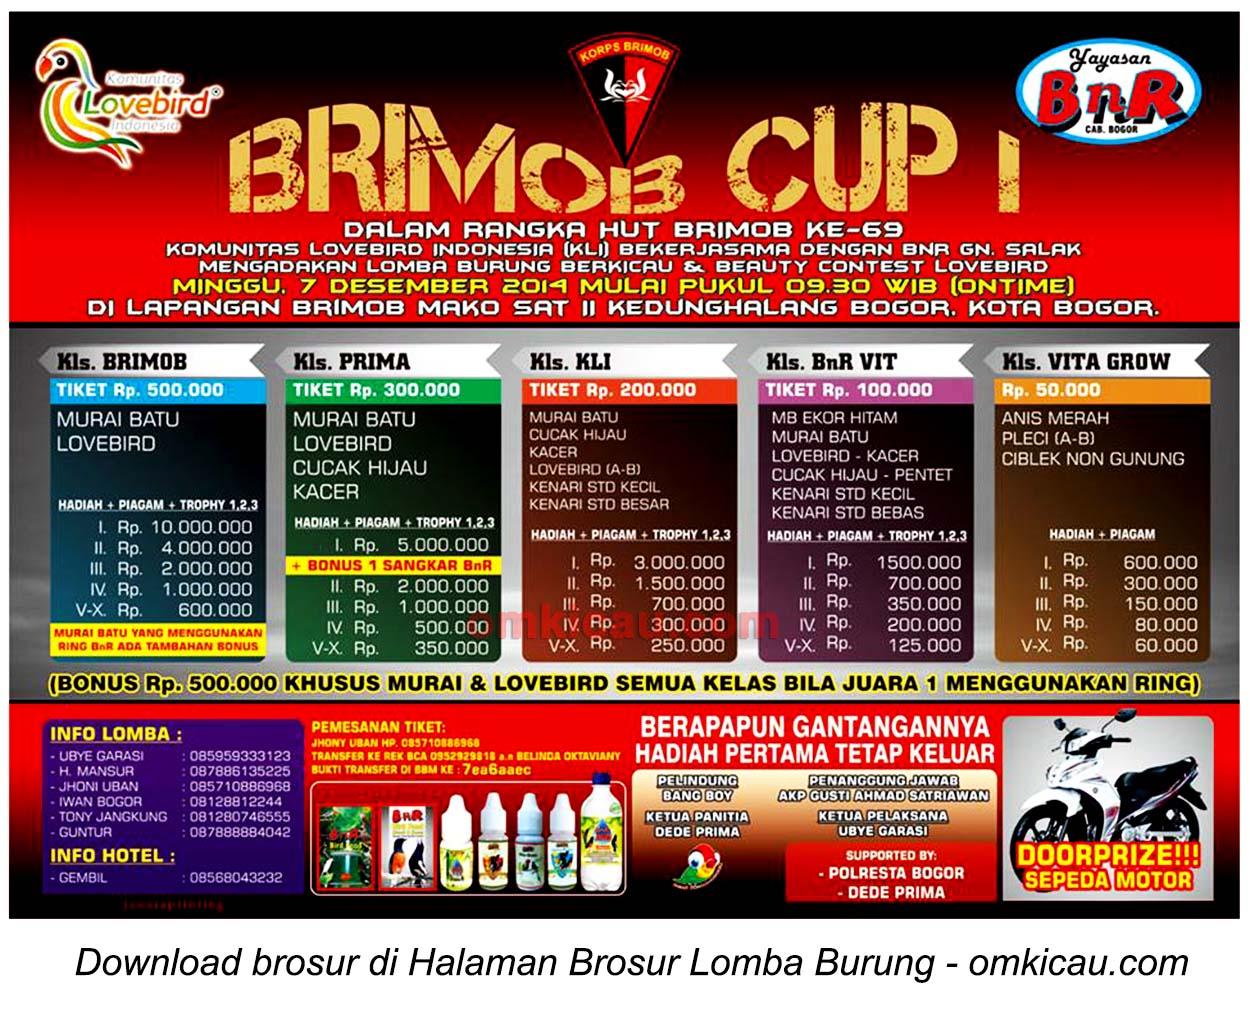 Brosur Lomba Burung Berkicau Brimob Cup I, Bogor, 7 Desember 2014